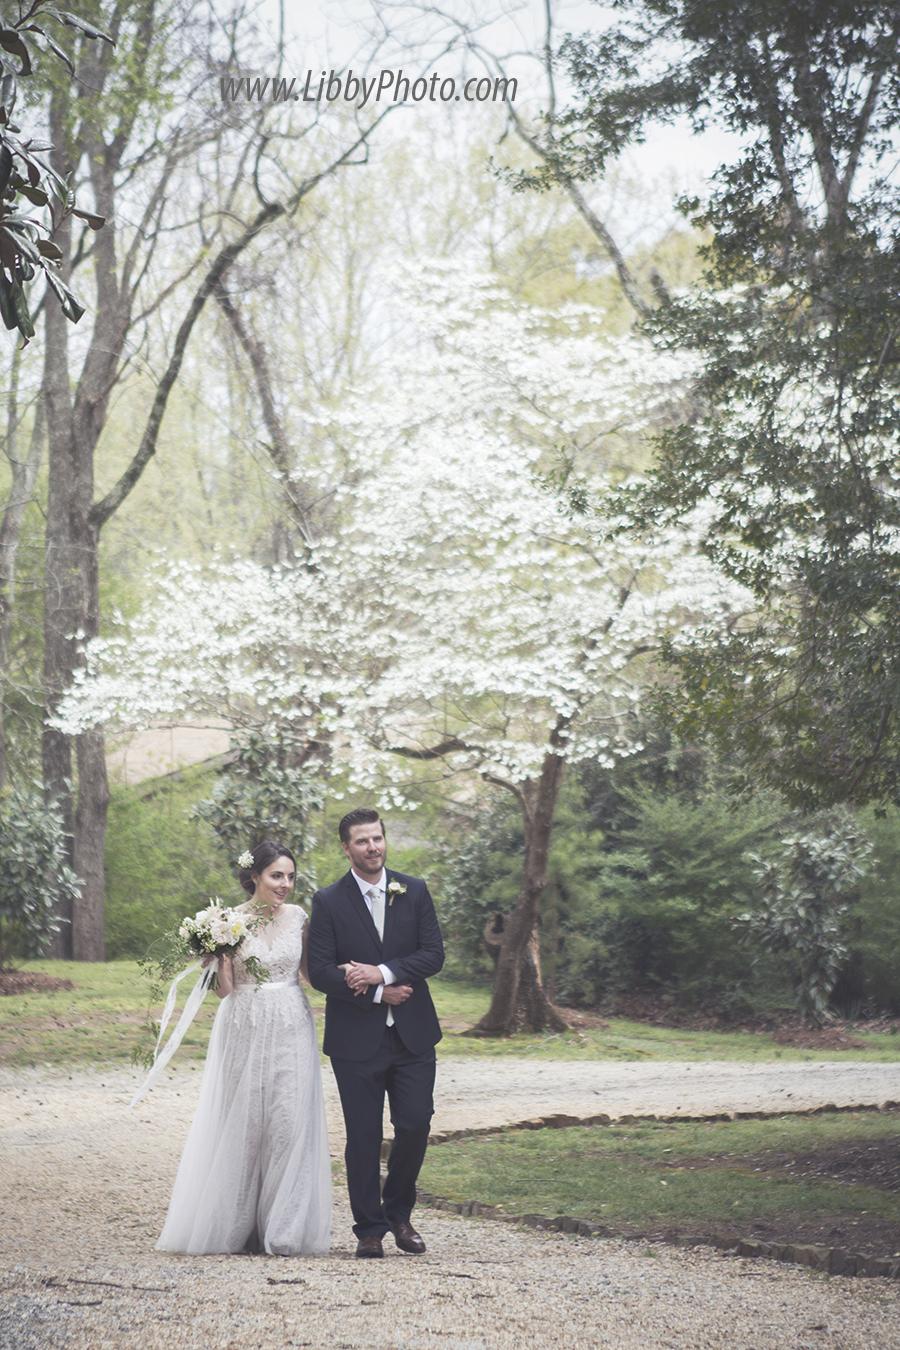 Atlanta wedding photography Libbyphoto (13).jpg